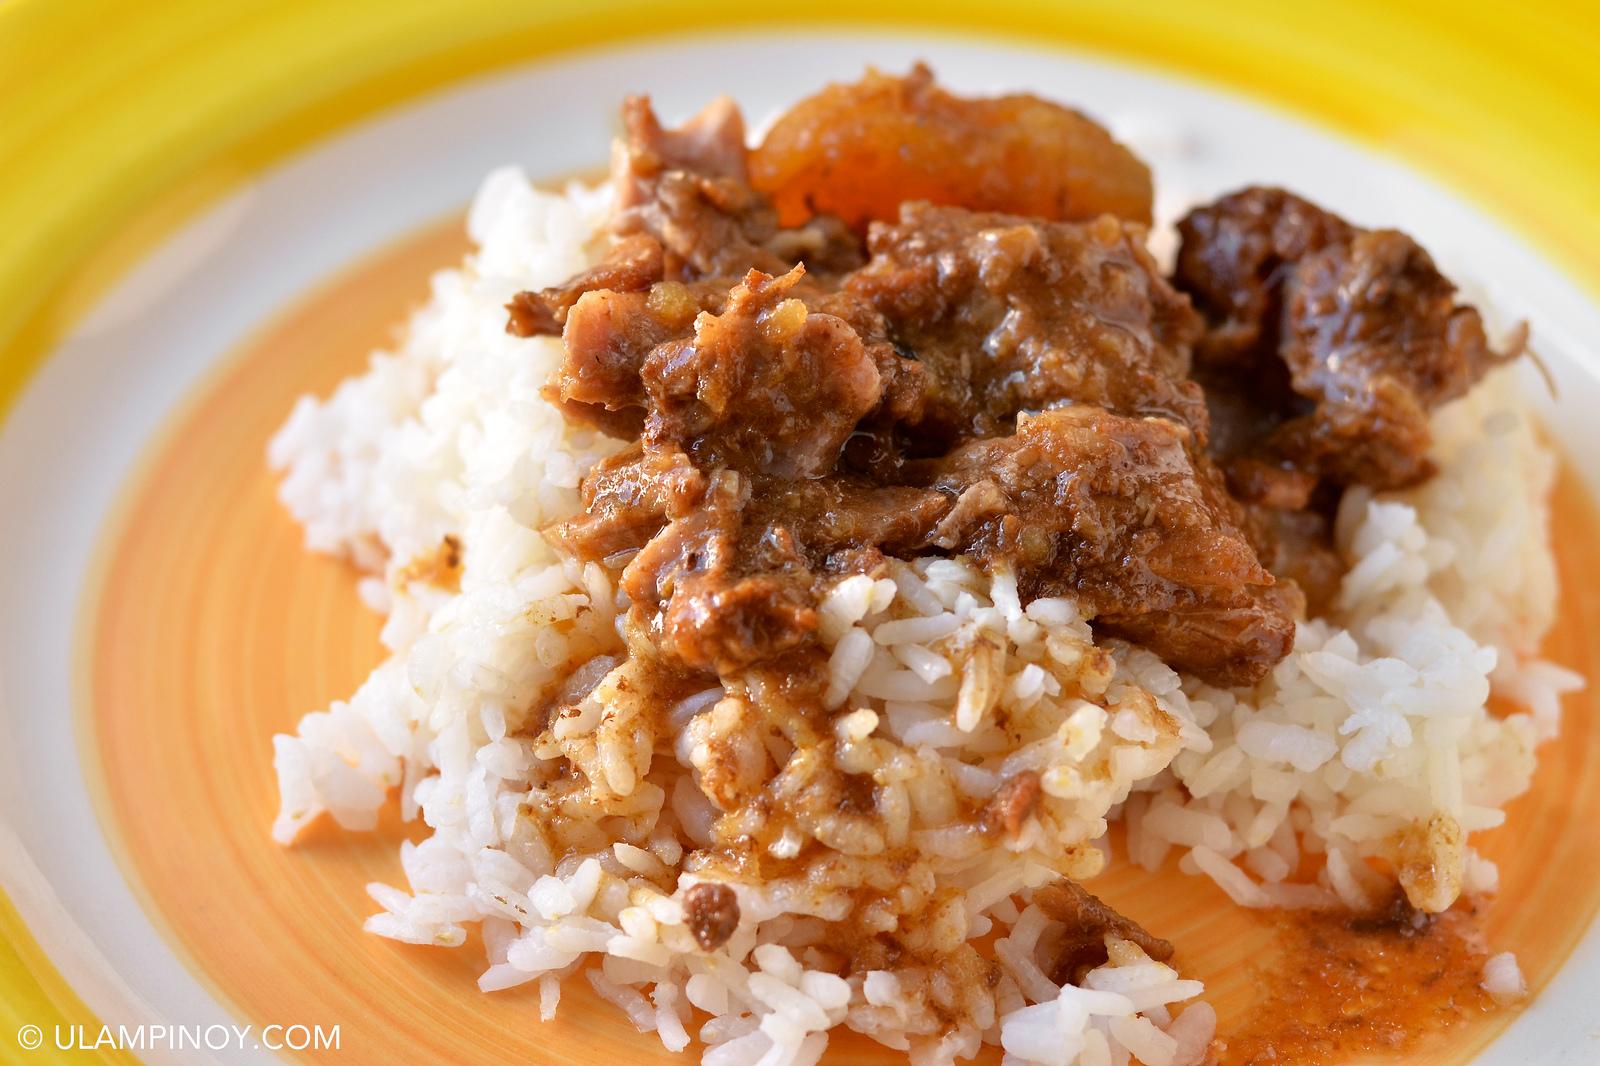 Delicious pork ribs adobo rice toppings